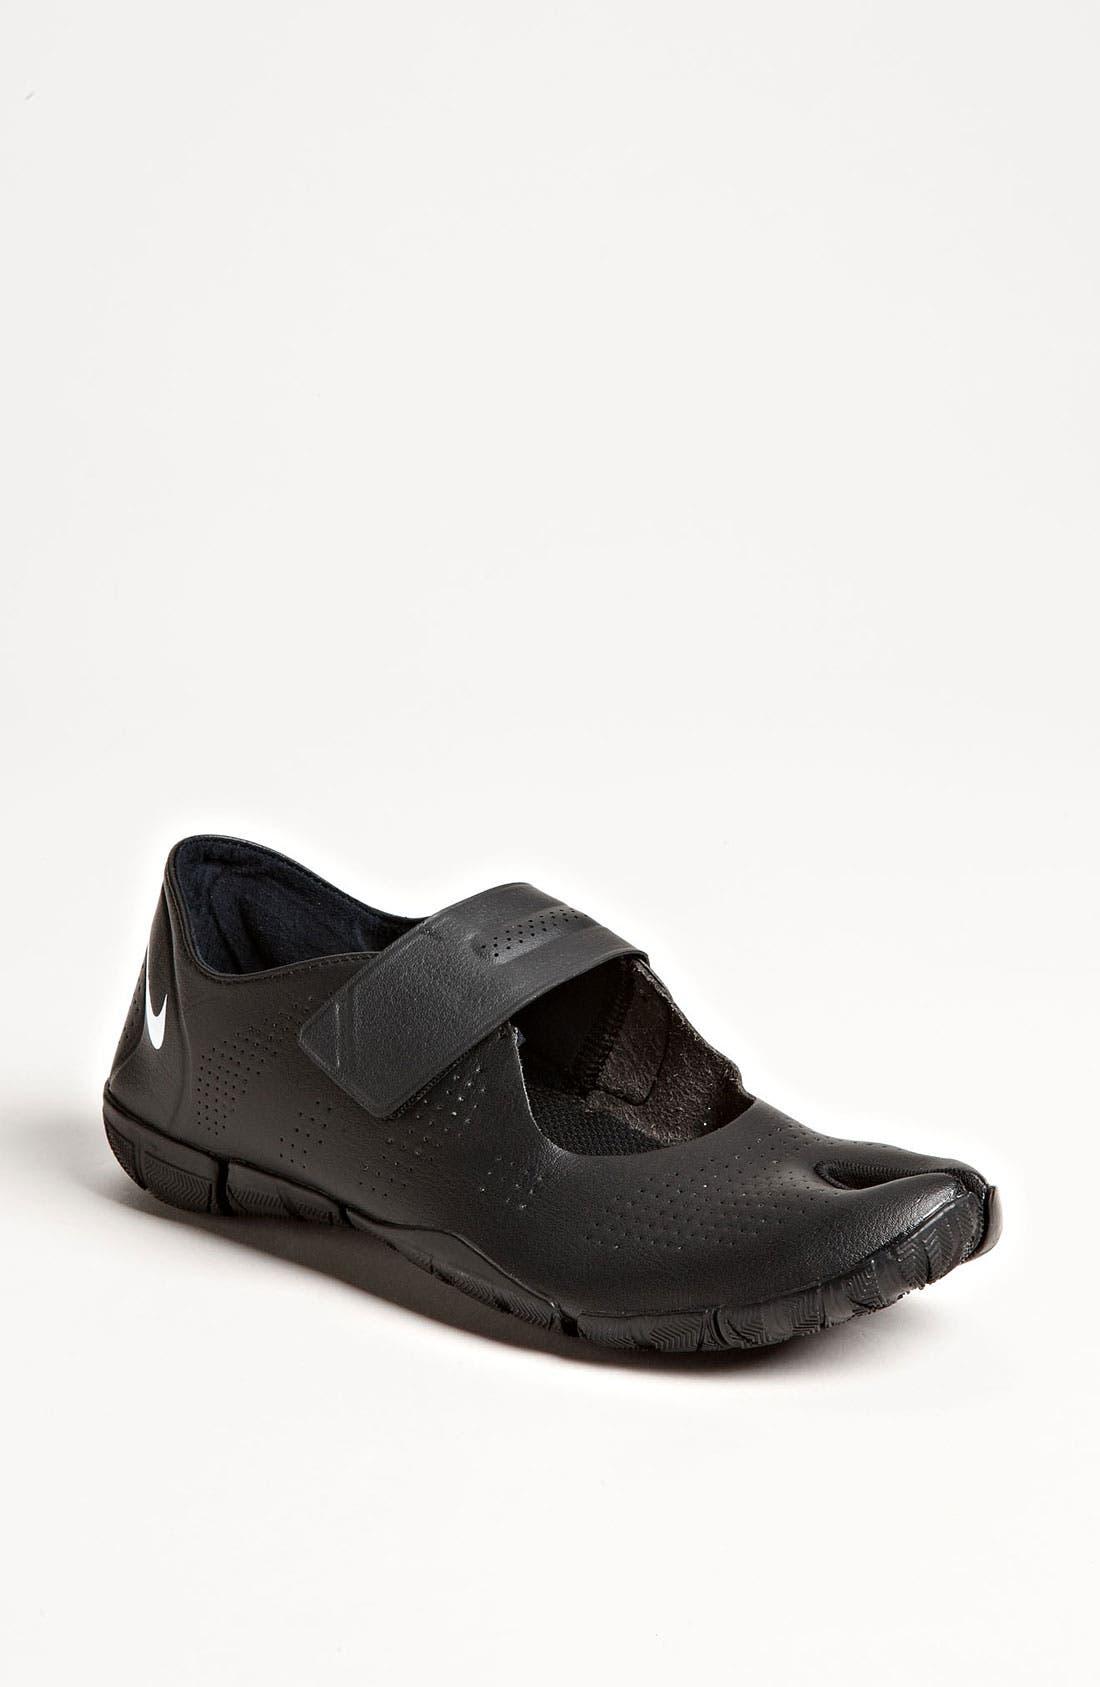 Alternate Image 1 Selected - Nike 'Free Gym' Training Shoe (Women)